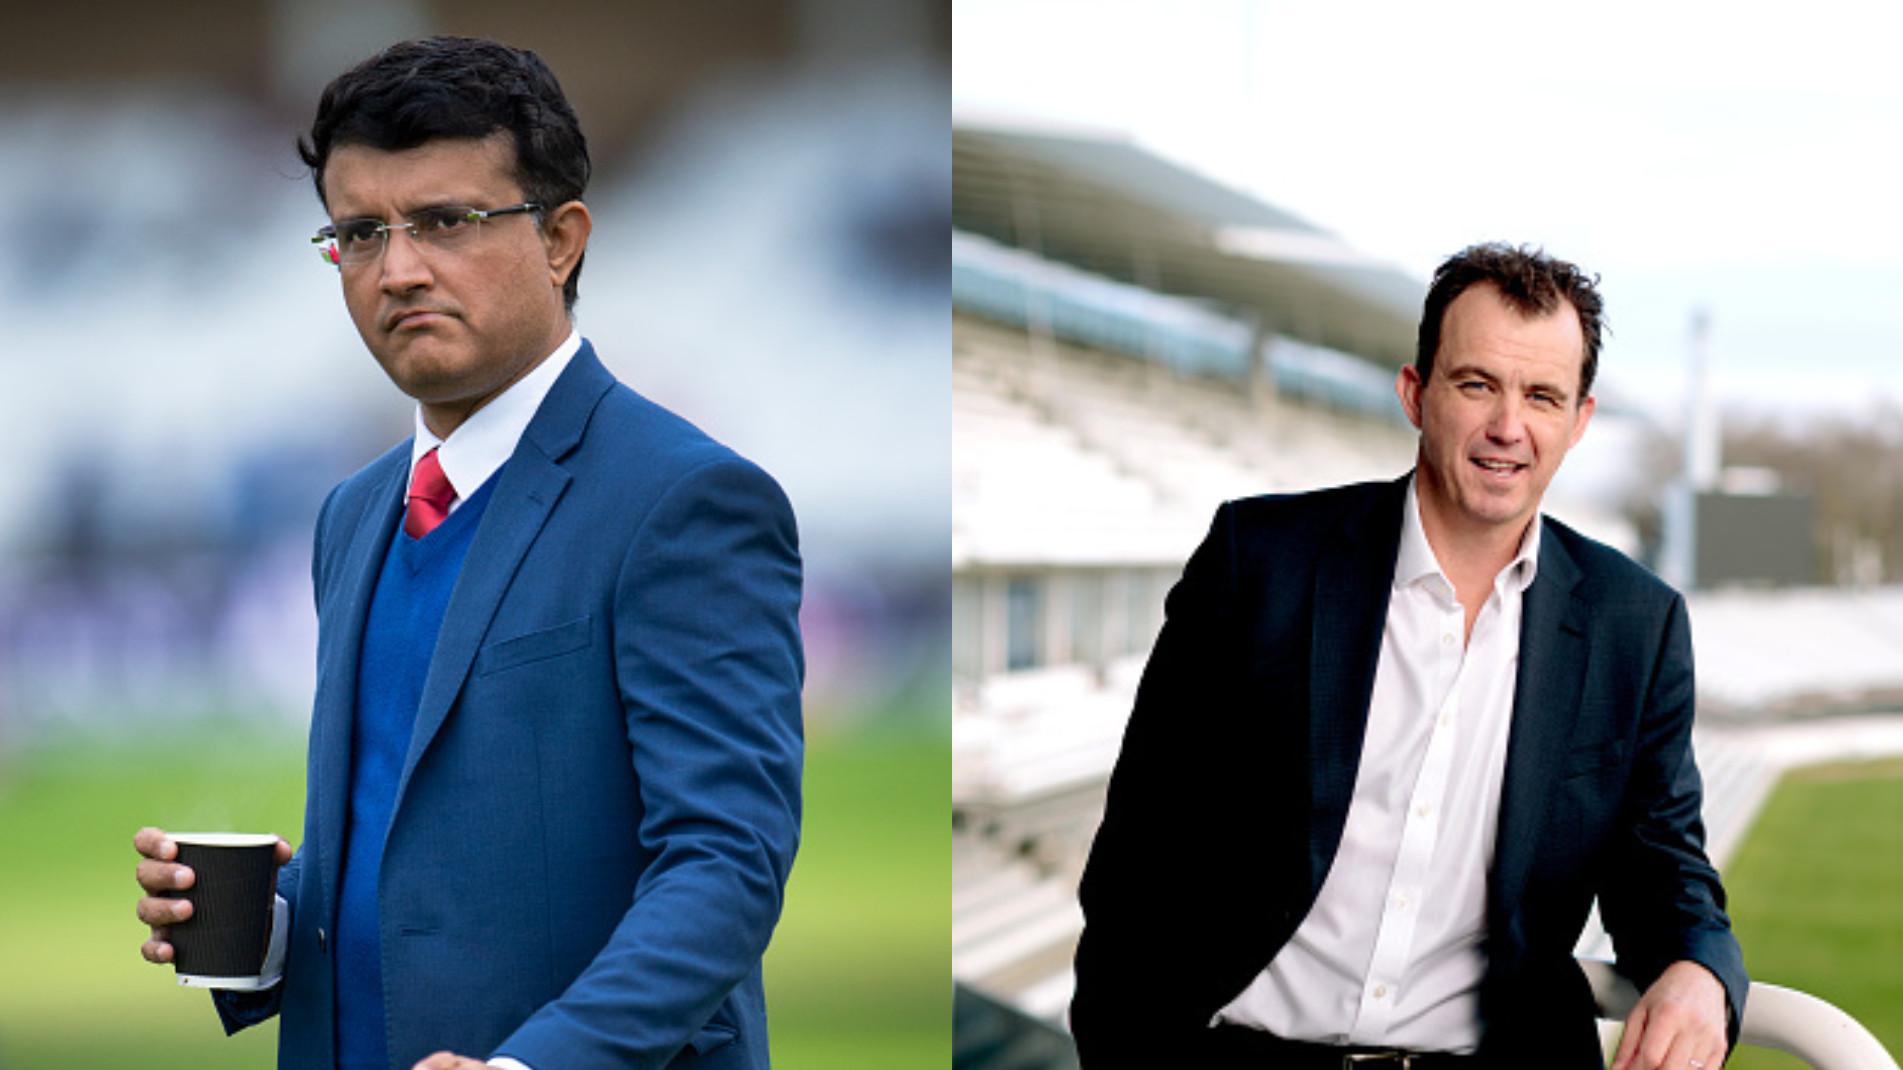 ENG v IND 2021: BCCI President Sourav Ganguly to meet ECB CEO on September 22 or 23 in UK- Report